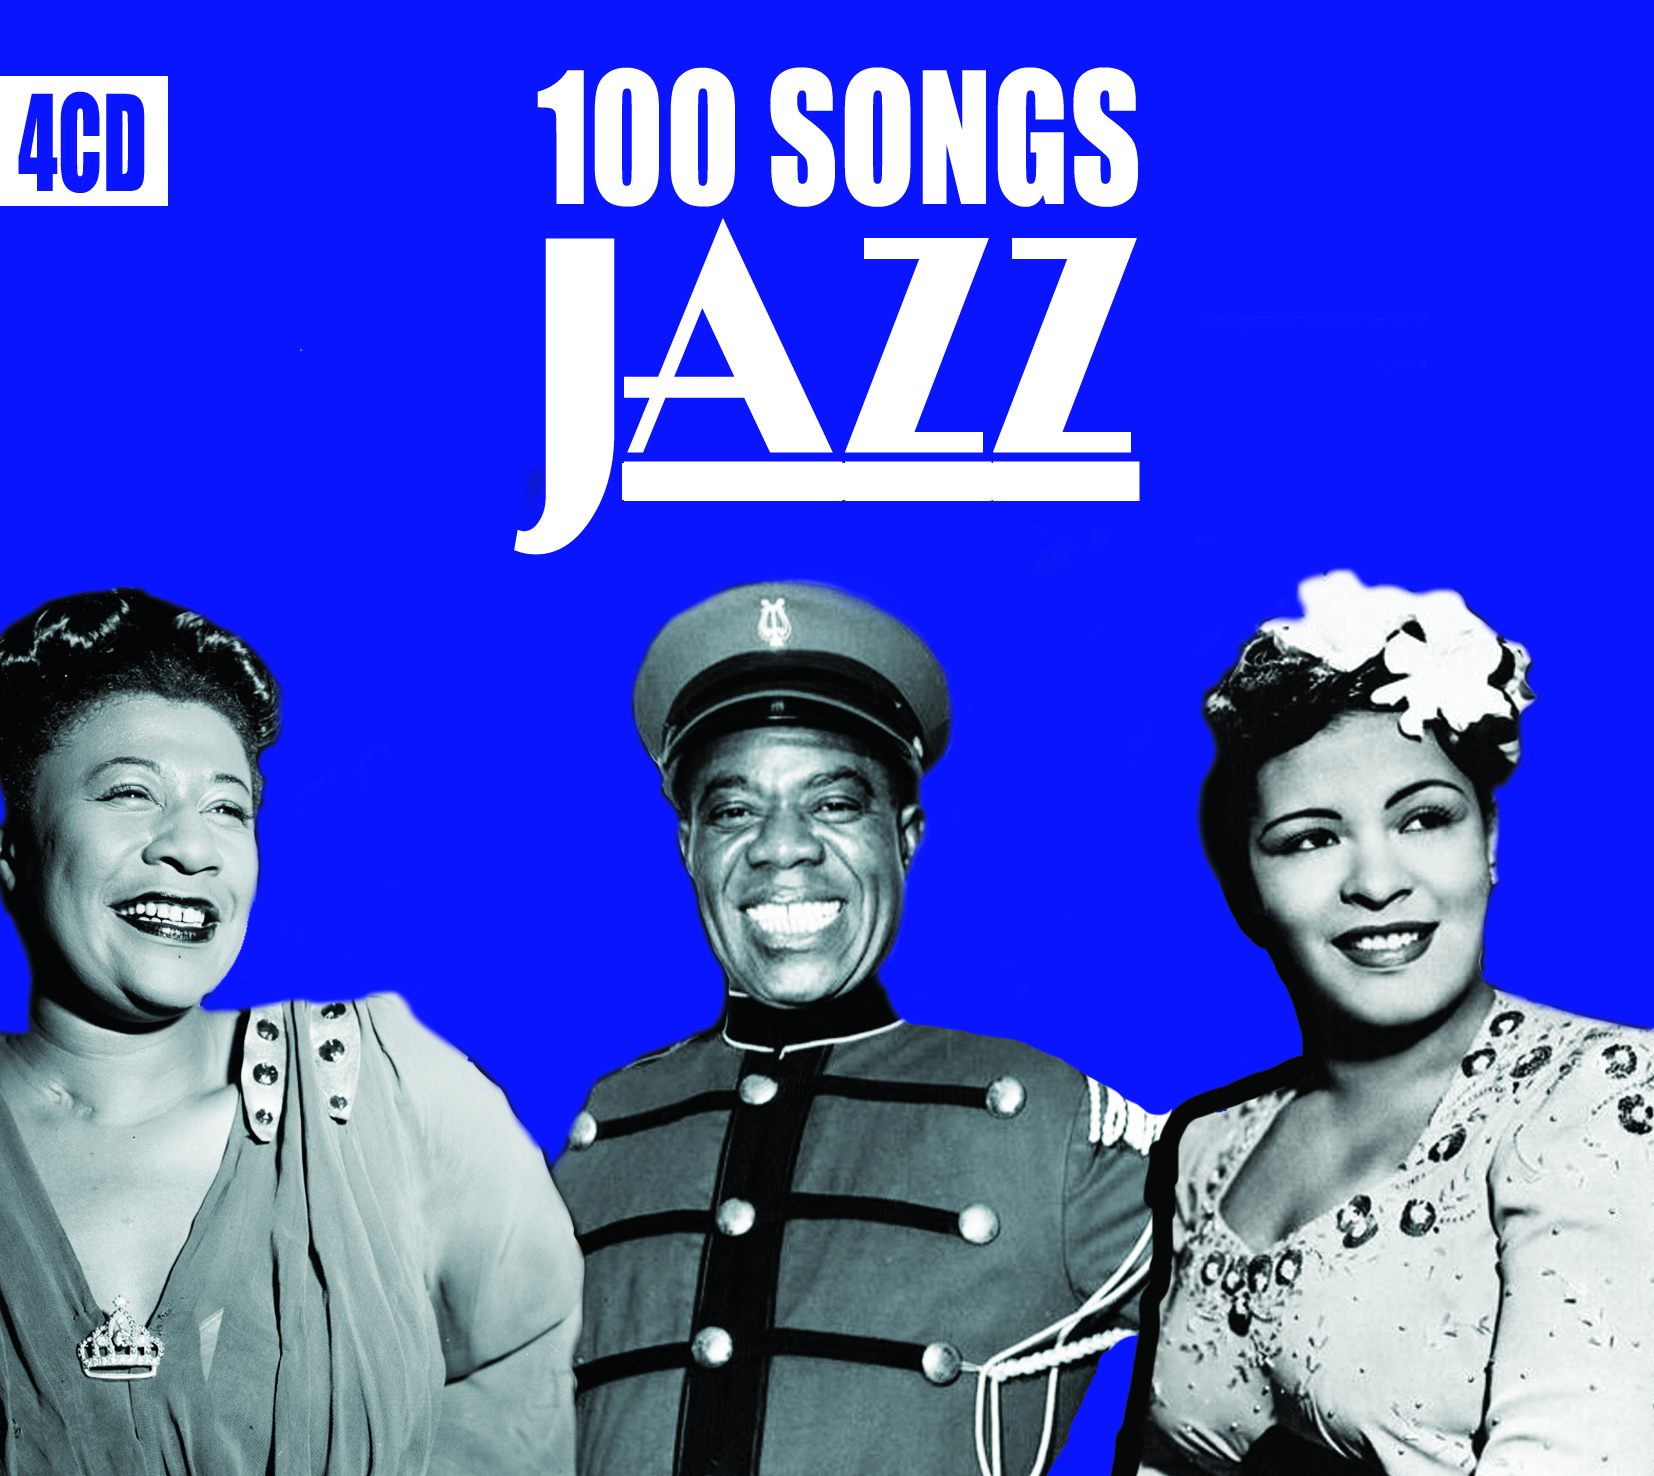 100 Songs Jazz